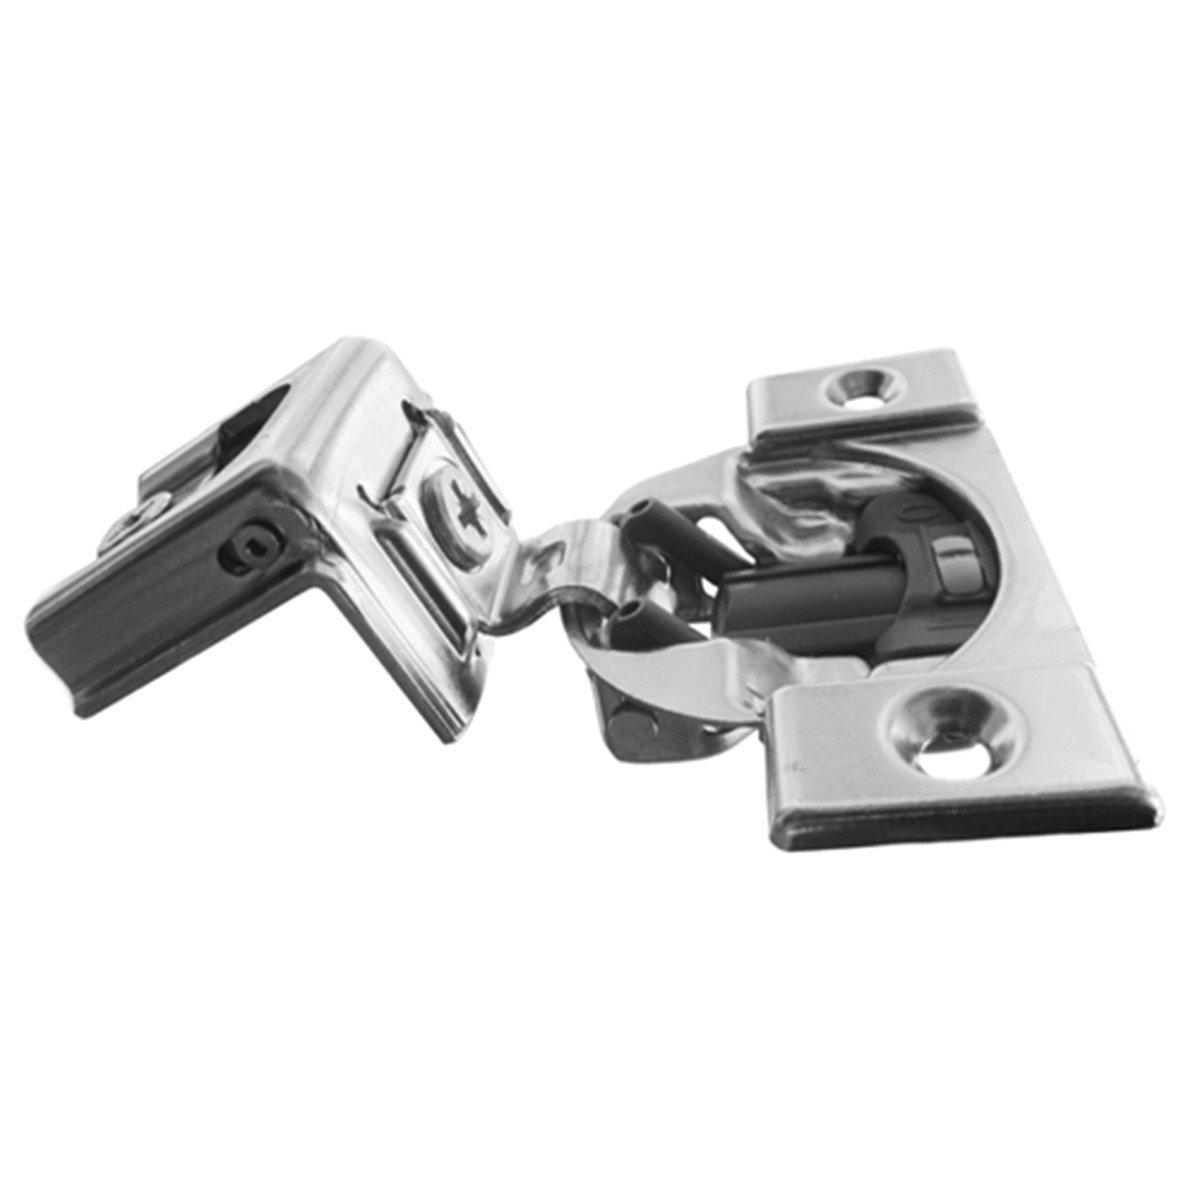 Blum ABL20.39C355B.20 39C355B.20, 1-1/4'' Overlay Soft Close Cabinet Hinge , Nickel Plated Steel (Pack of 20)